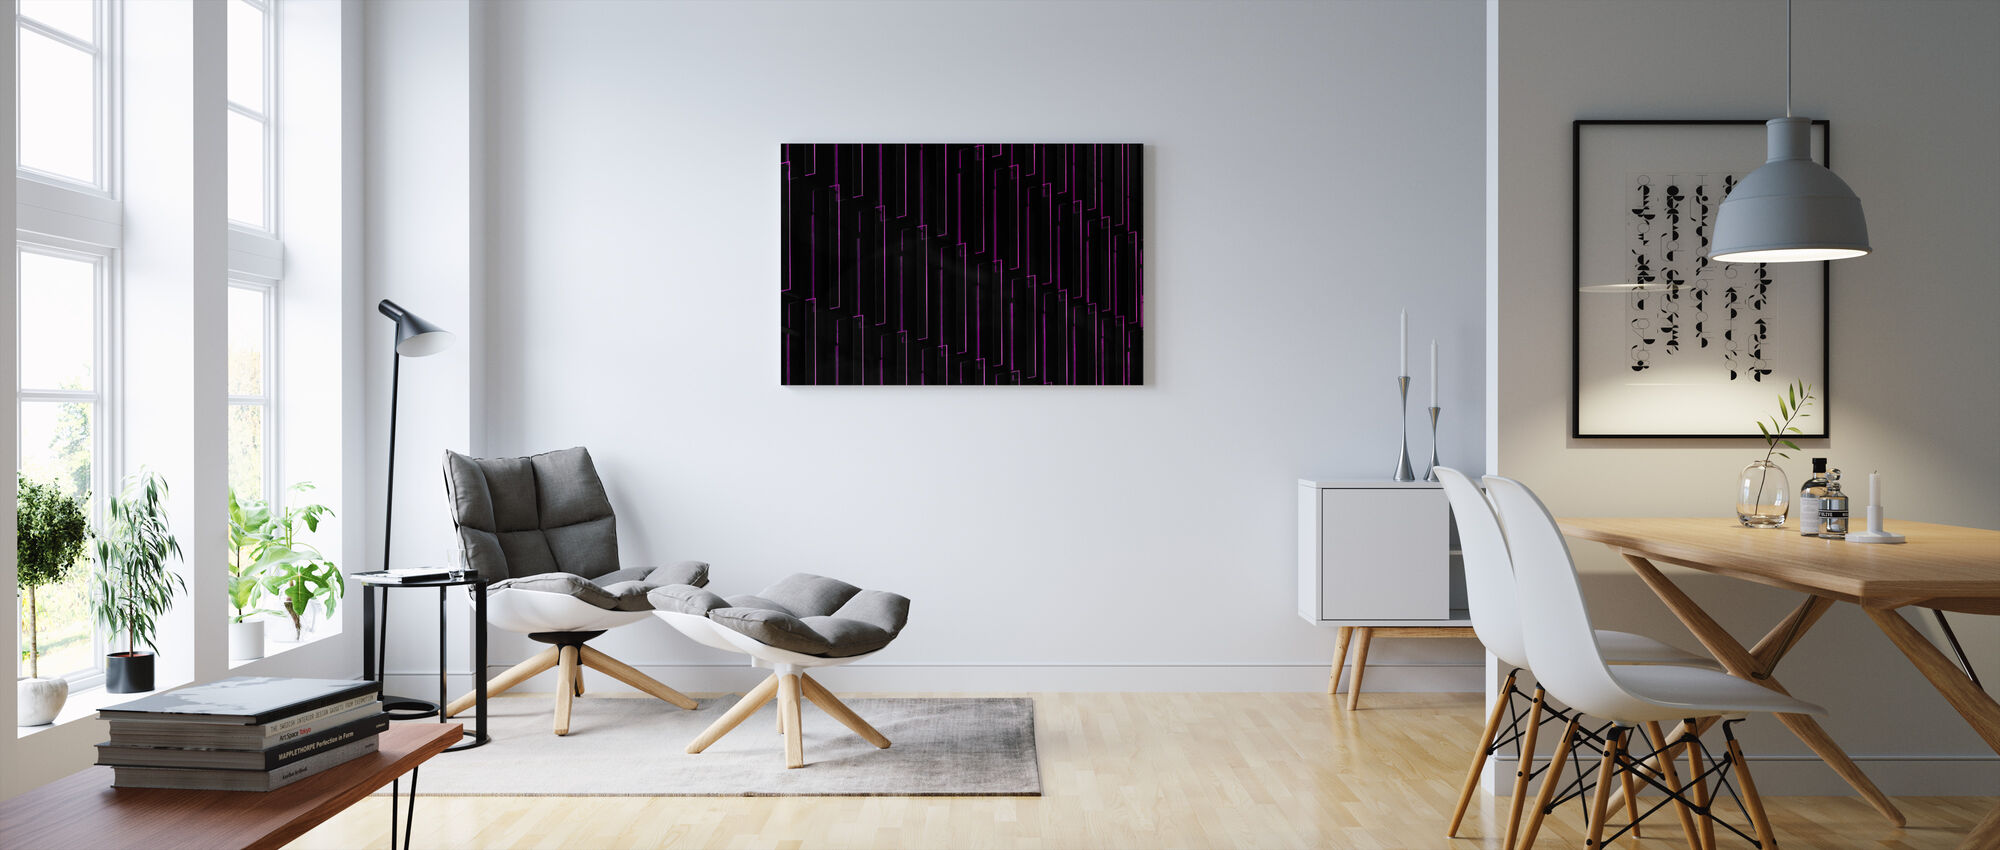 Purple Neon Lights - Canvas print - Living Room